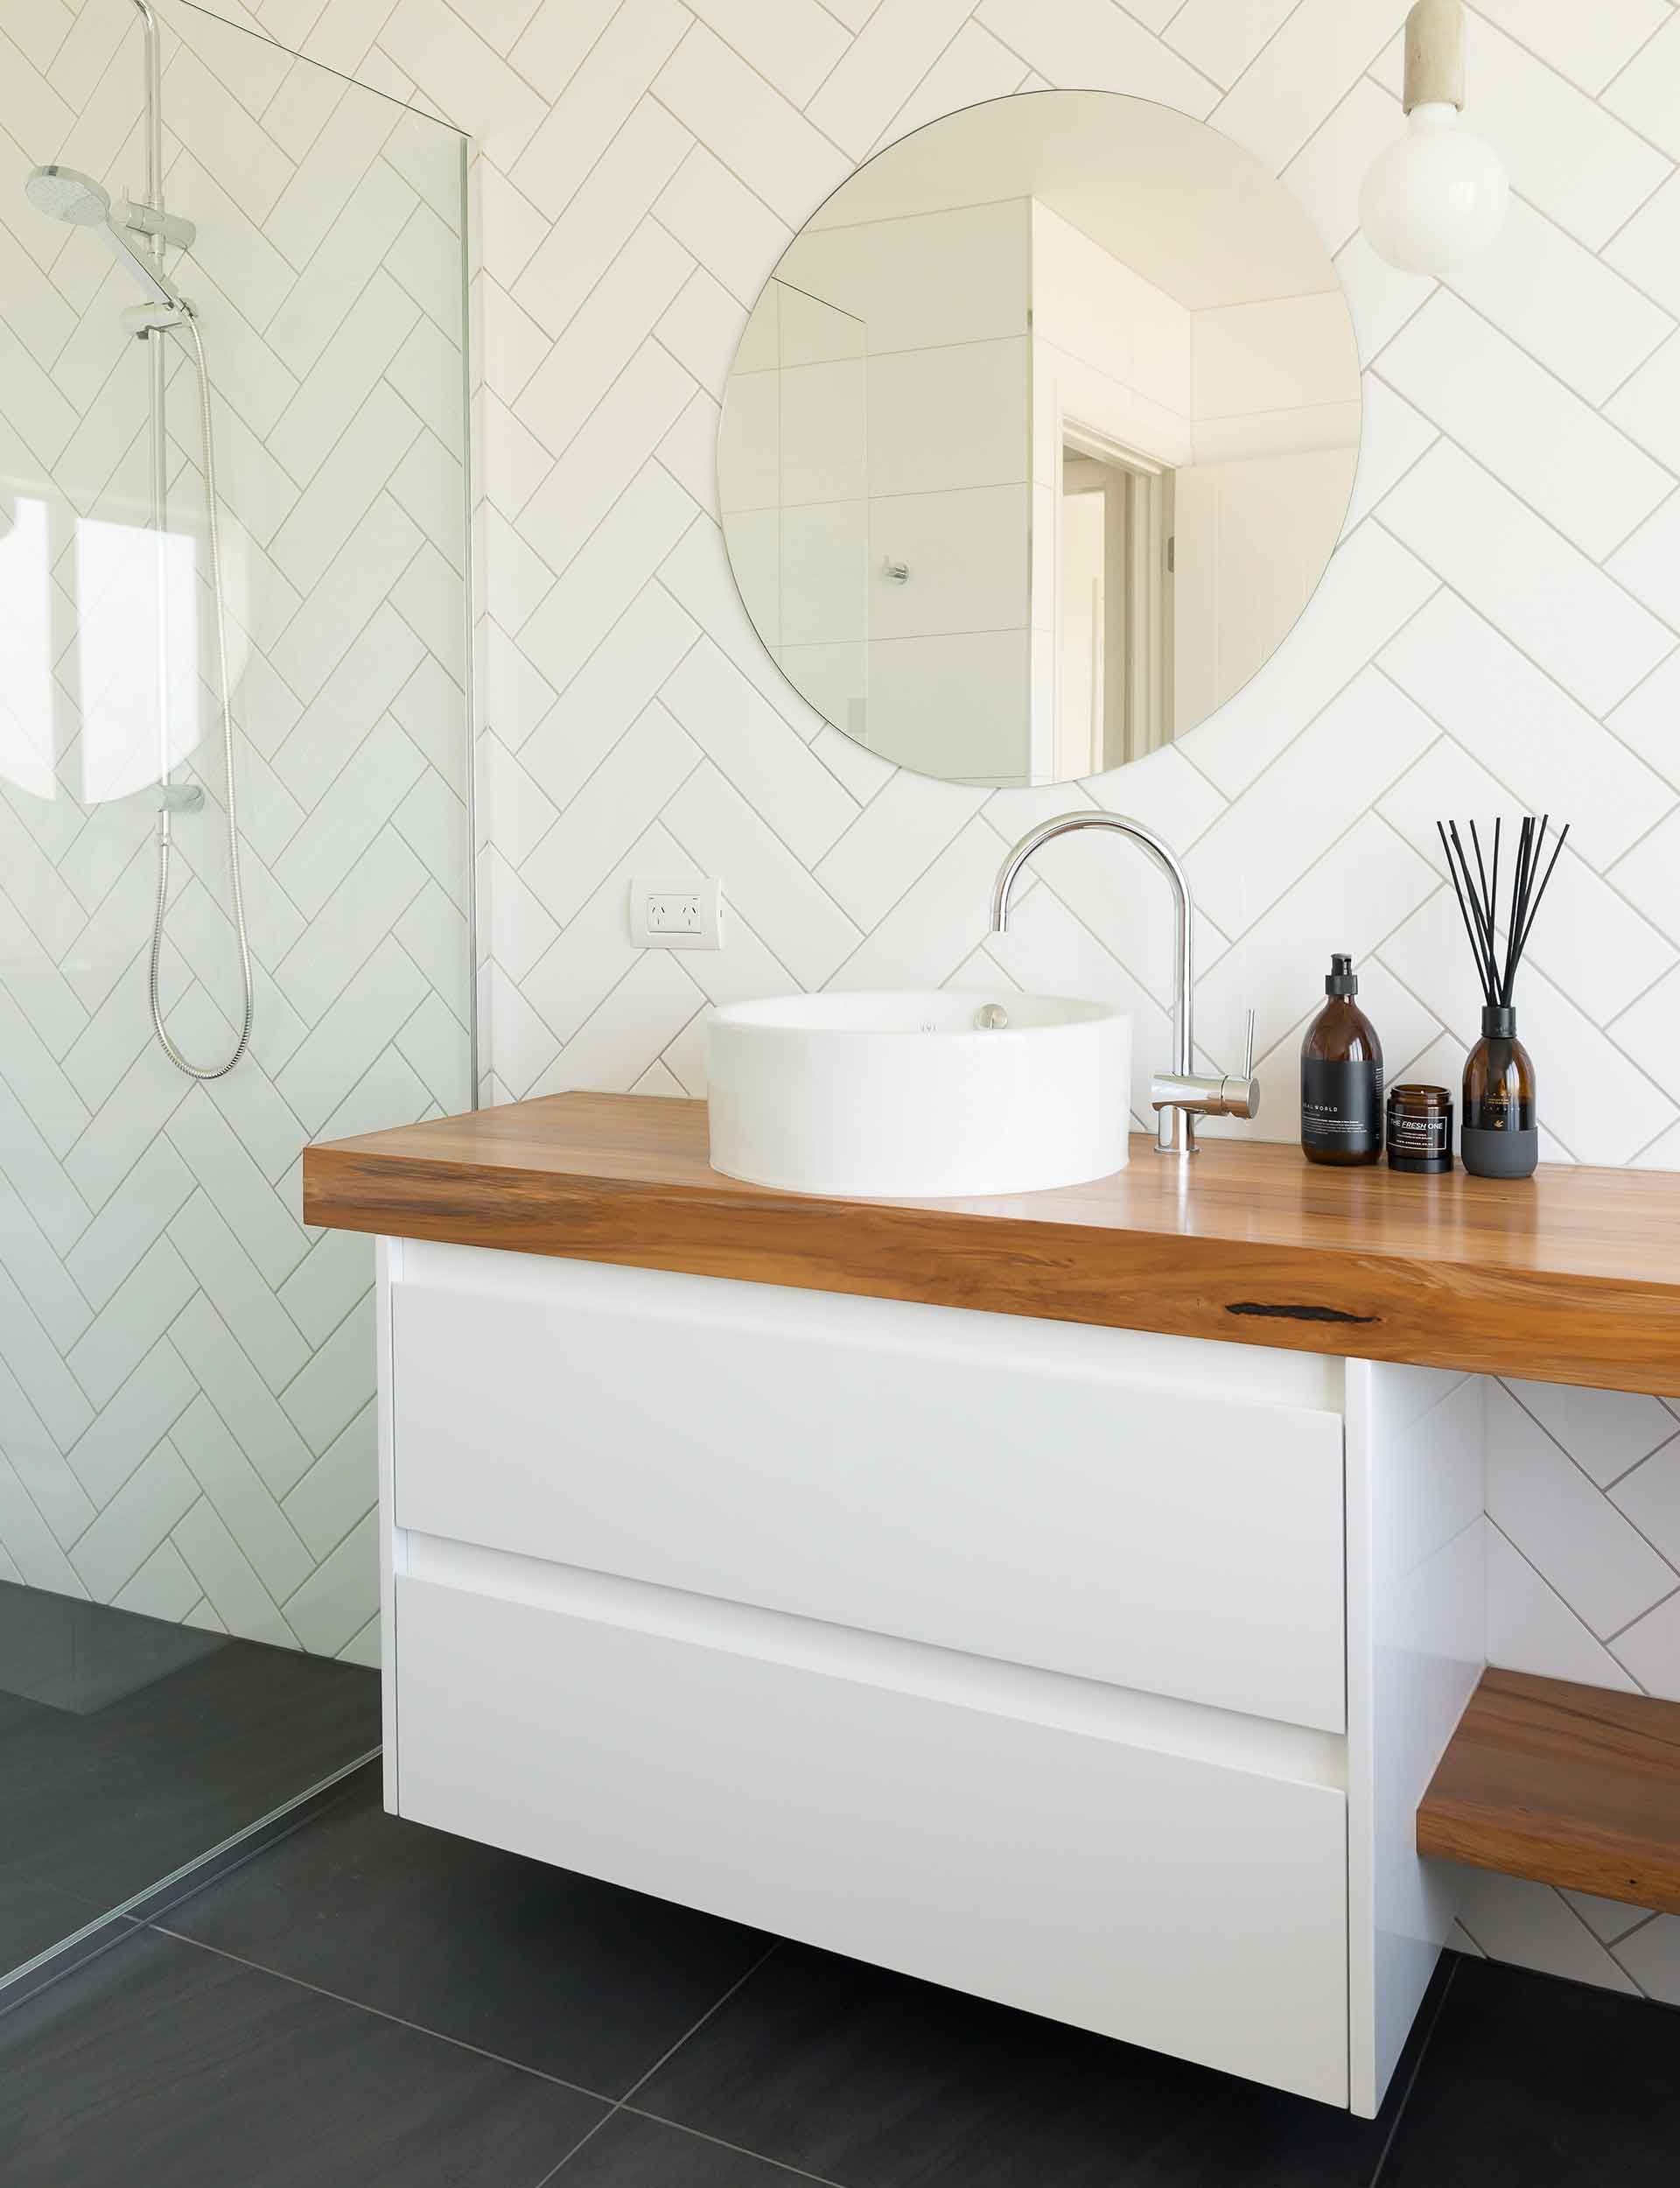 5 essential design hacks that will inspire your bathroom renovation